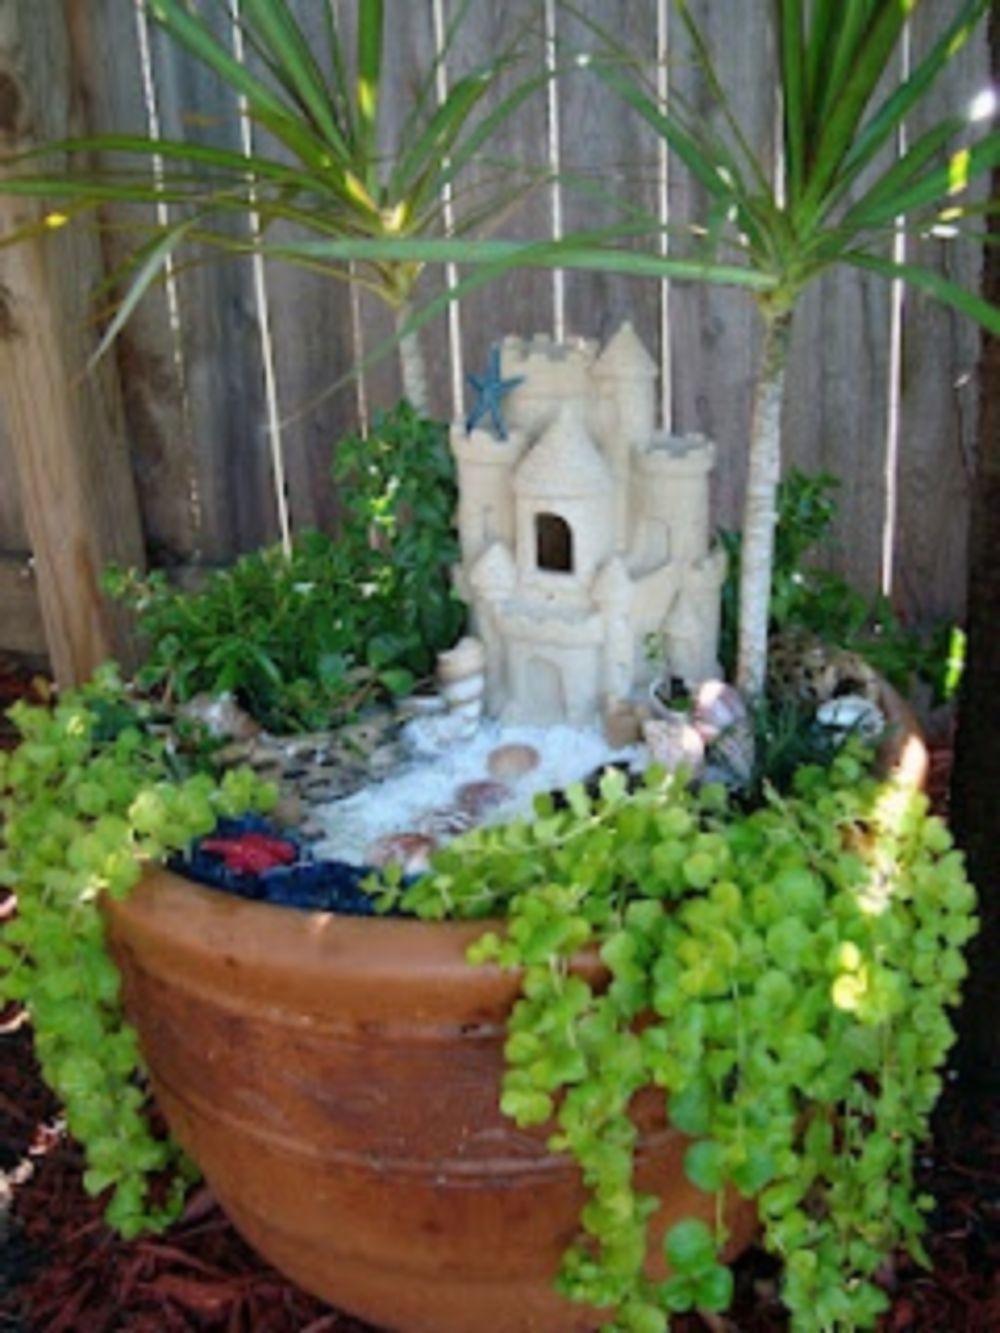 45 Best Gardening Ideas: Mermaid and Beach Themed Fairy Garden ...